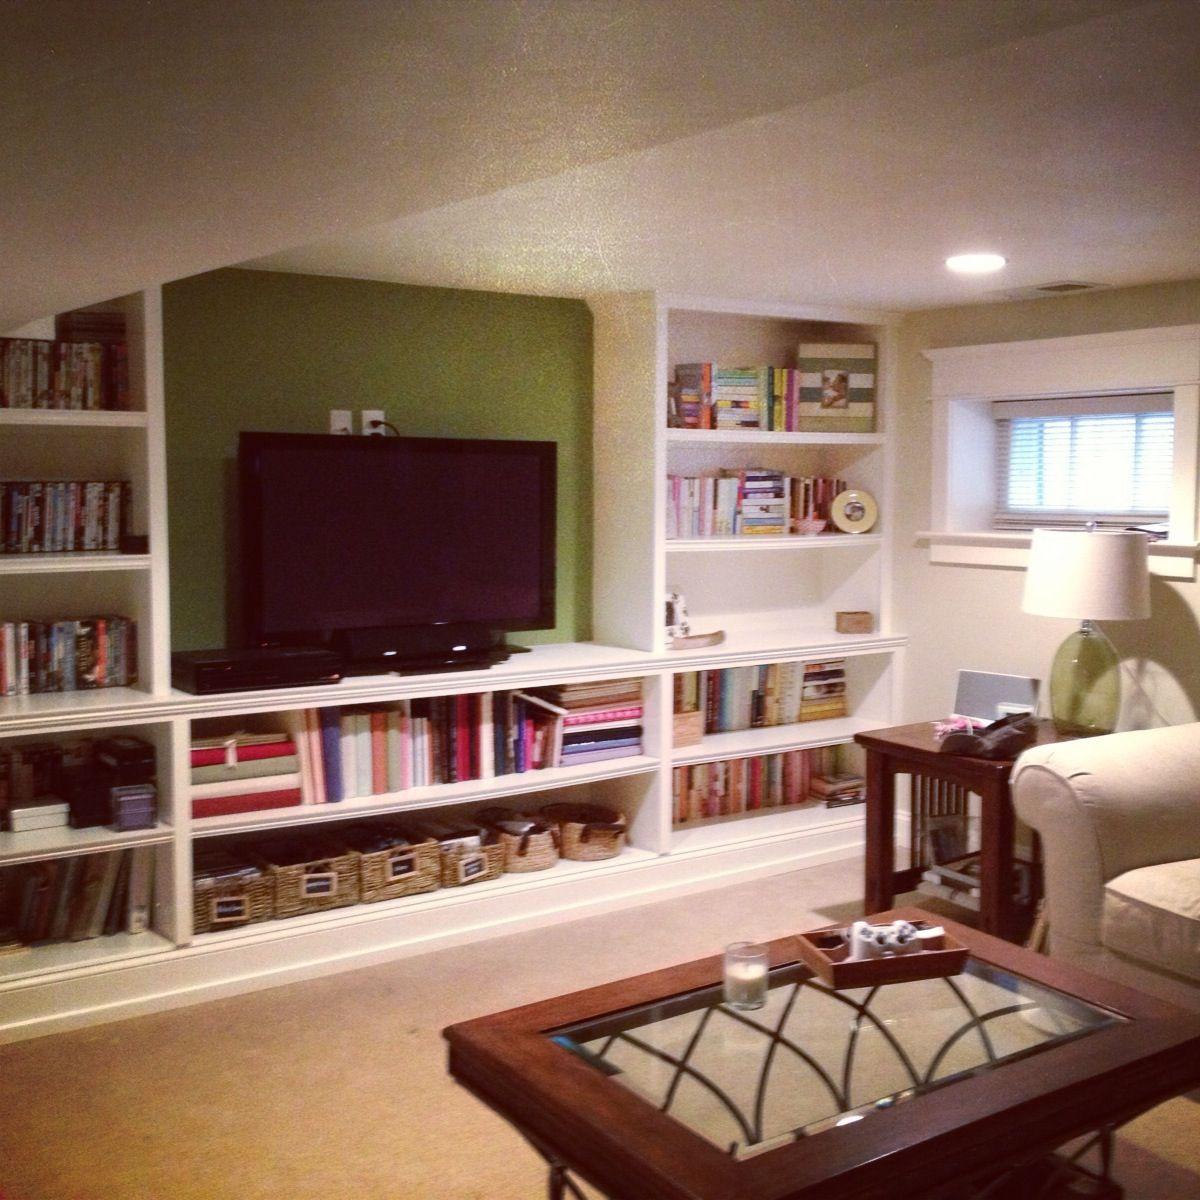 Family Room With Tv: Basement. Rec Room. Tv Room. Built In Shelves.